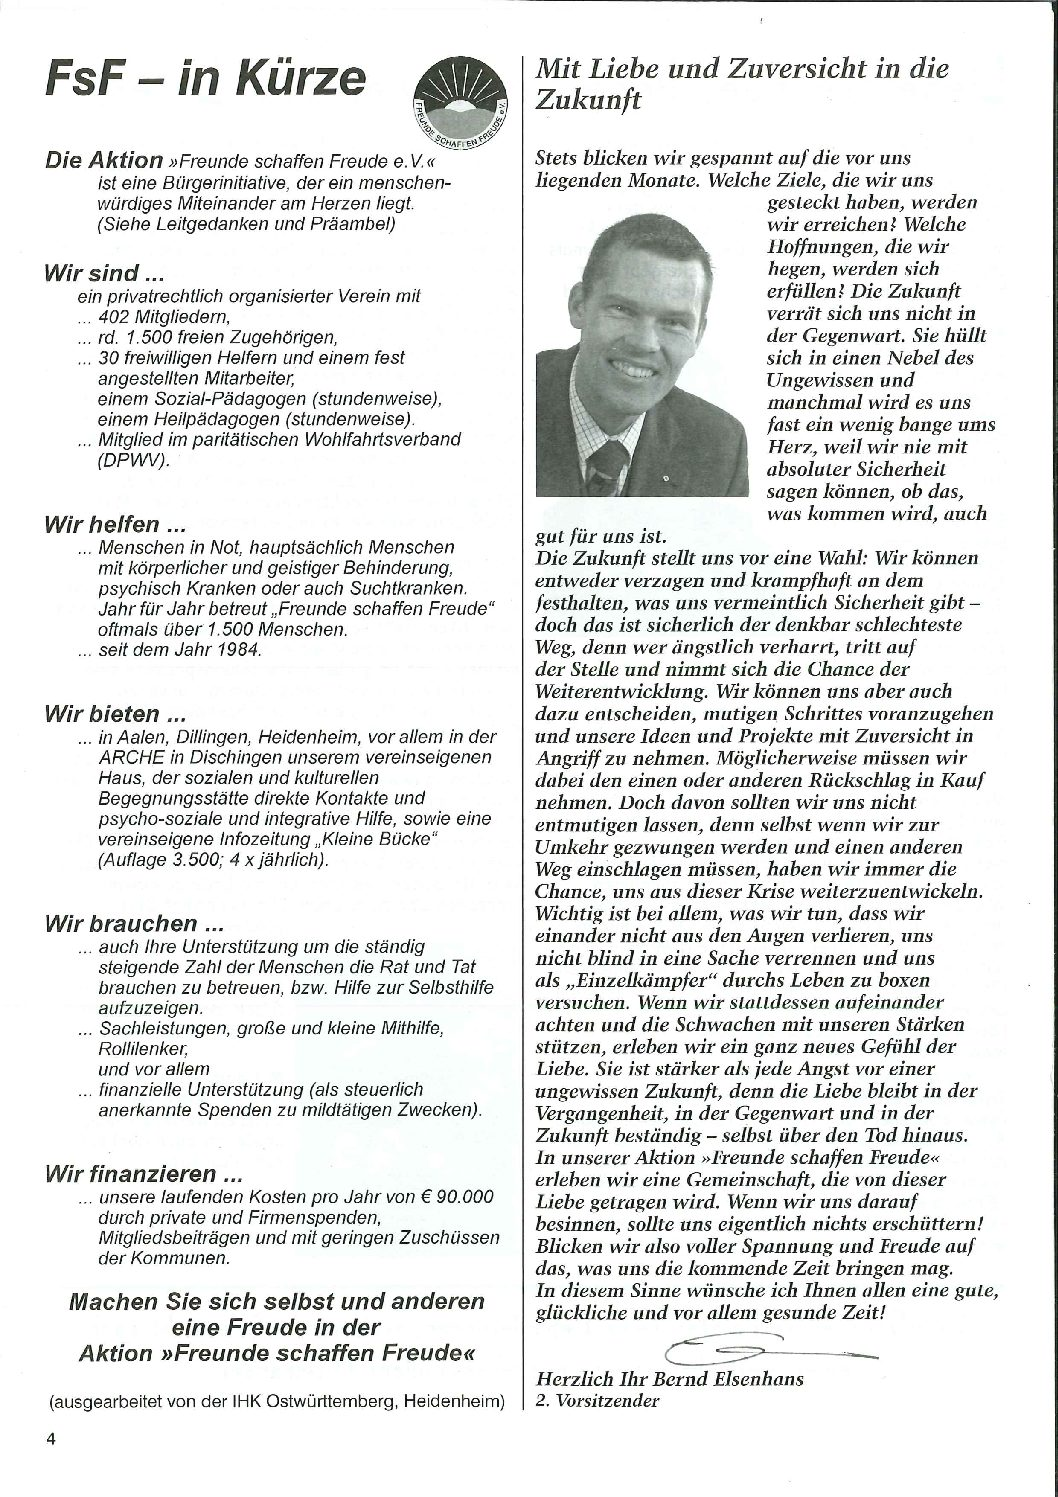 FsF: Vorwort Bernd Elsenhans